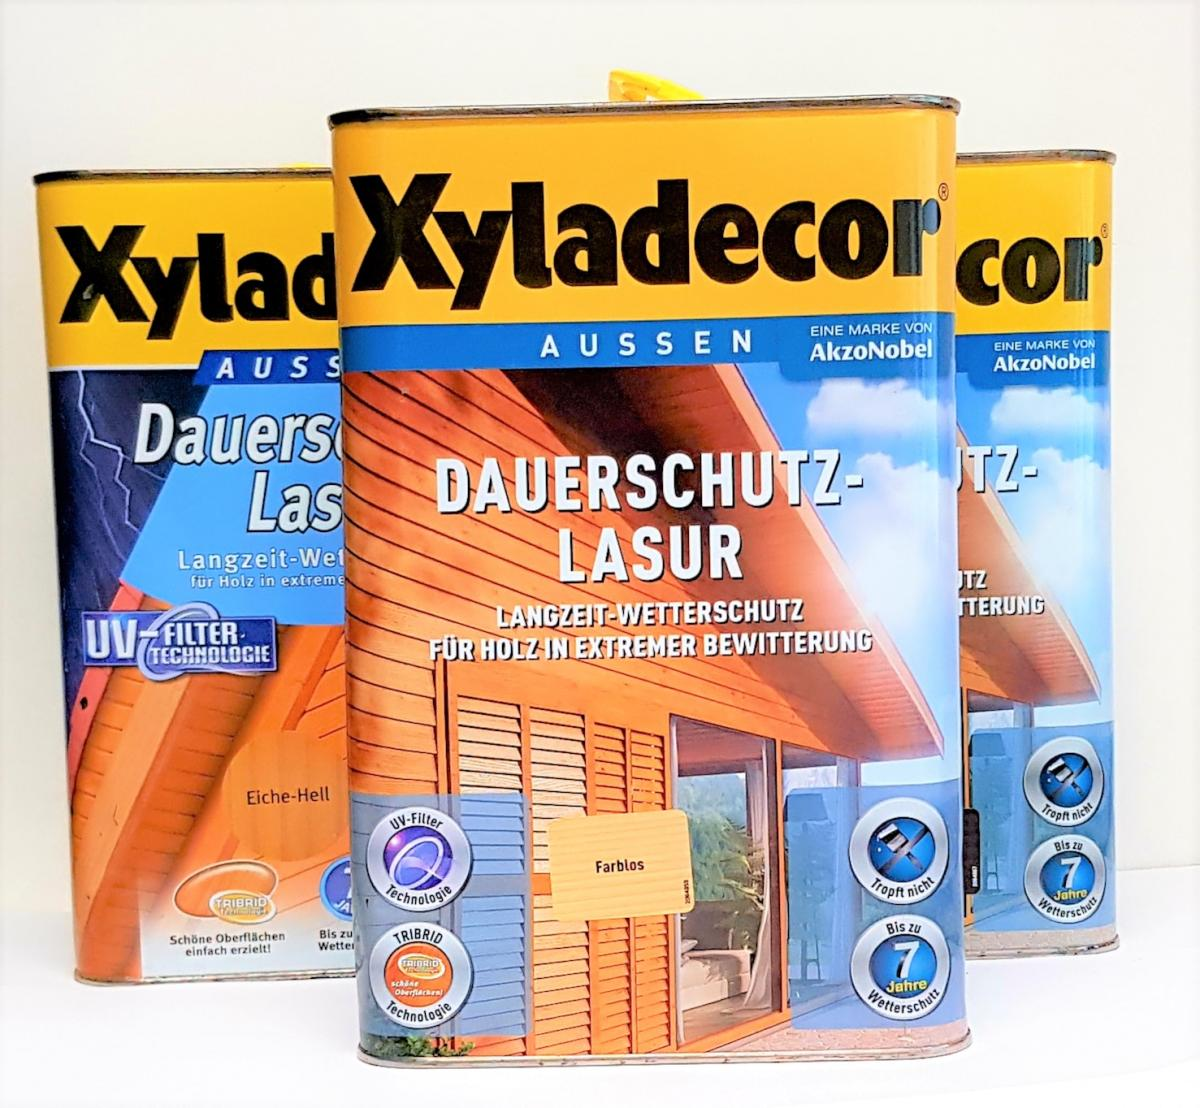 Xyladecor Farben.Xyladecor 4l Dauerschutzlasur Lasur Dauer Farbe Holz Anstrich